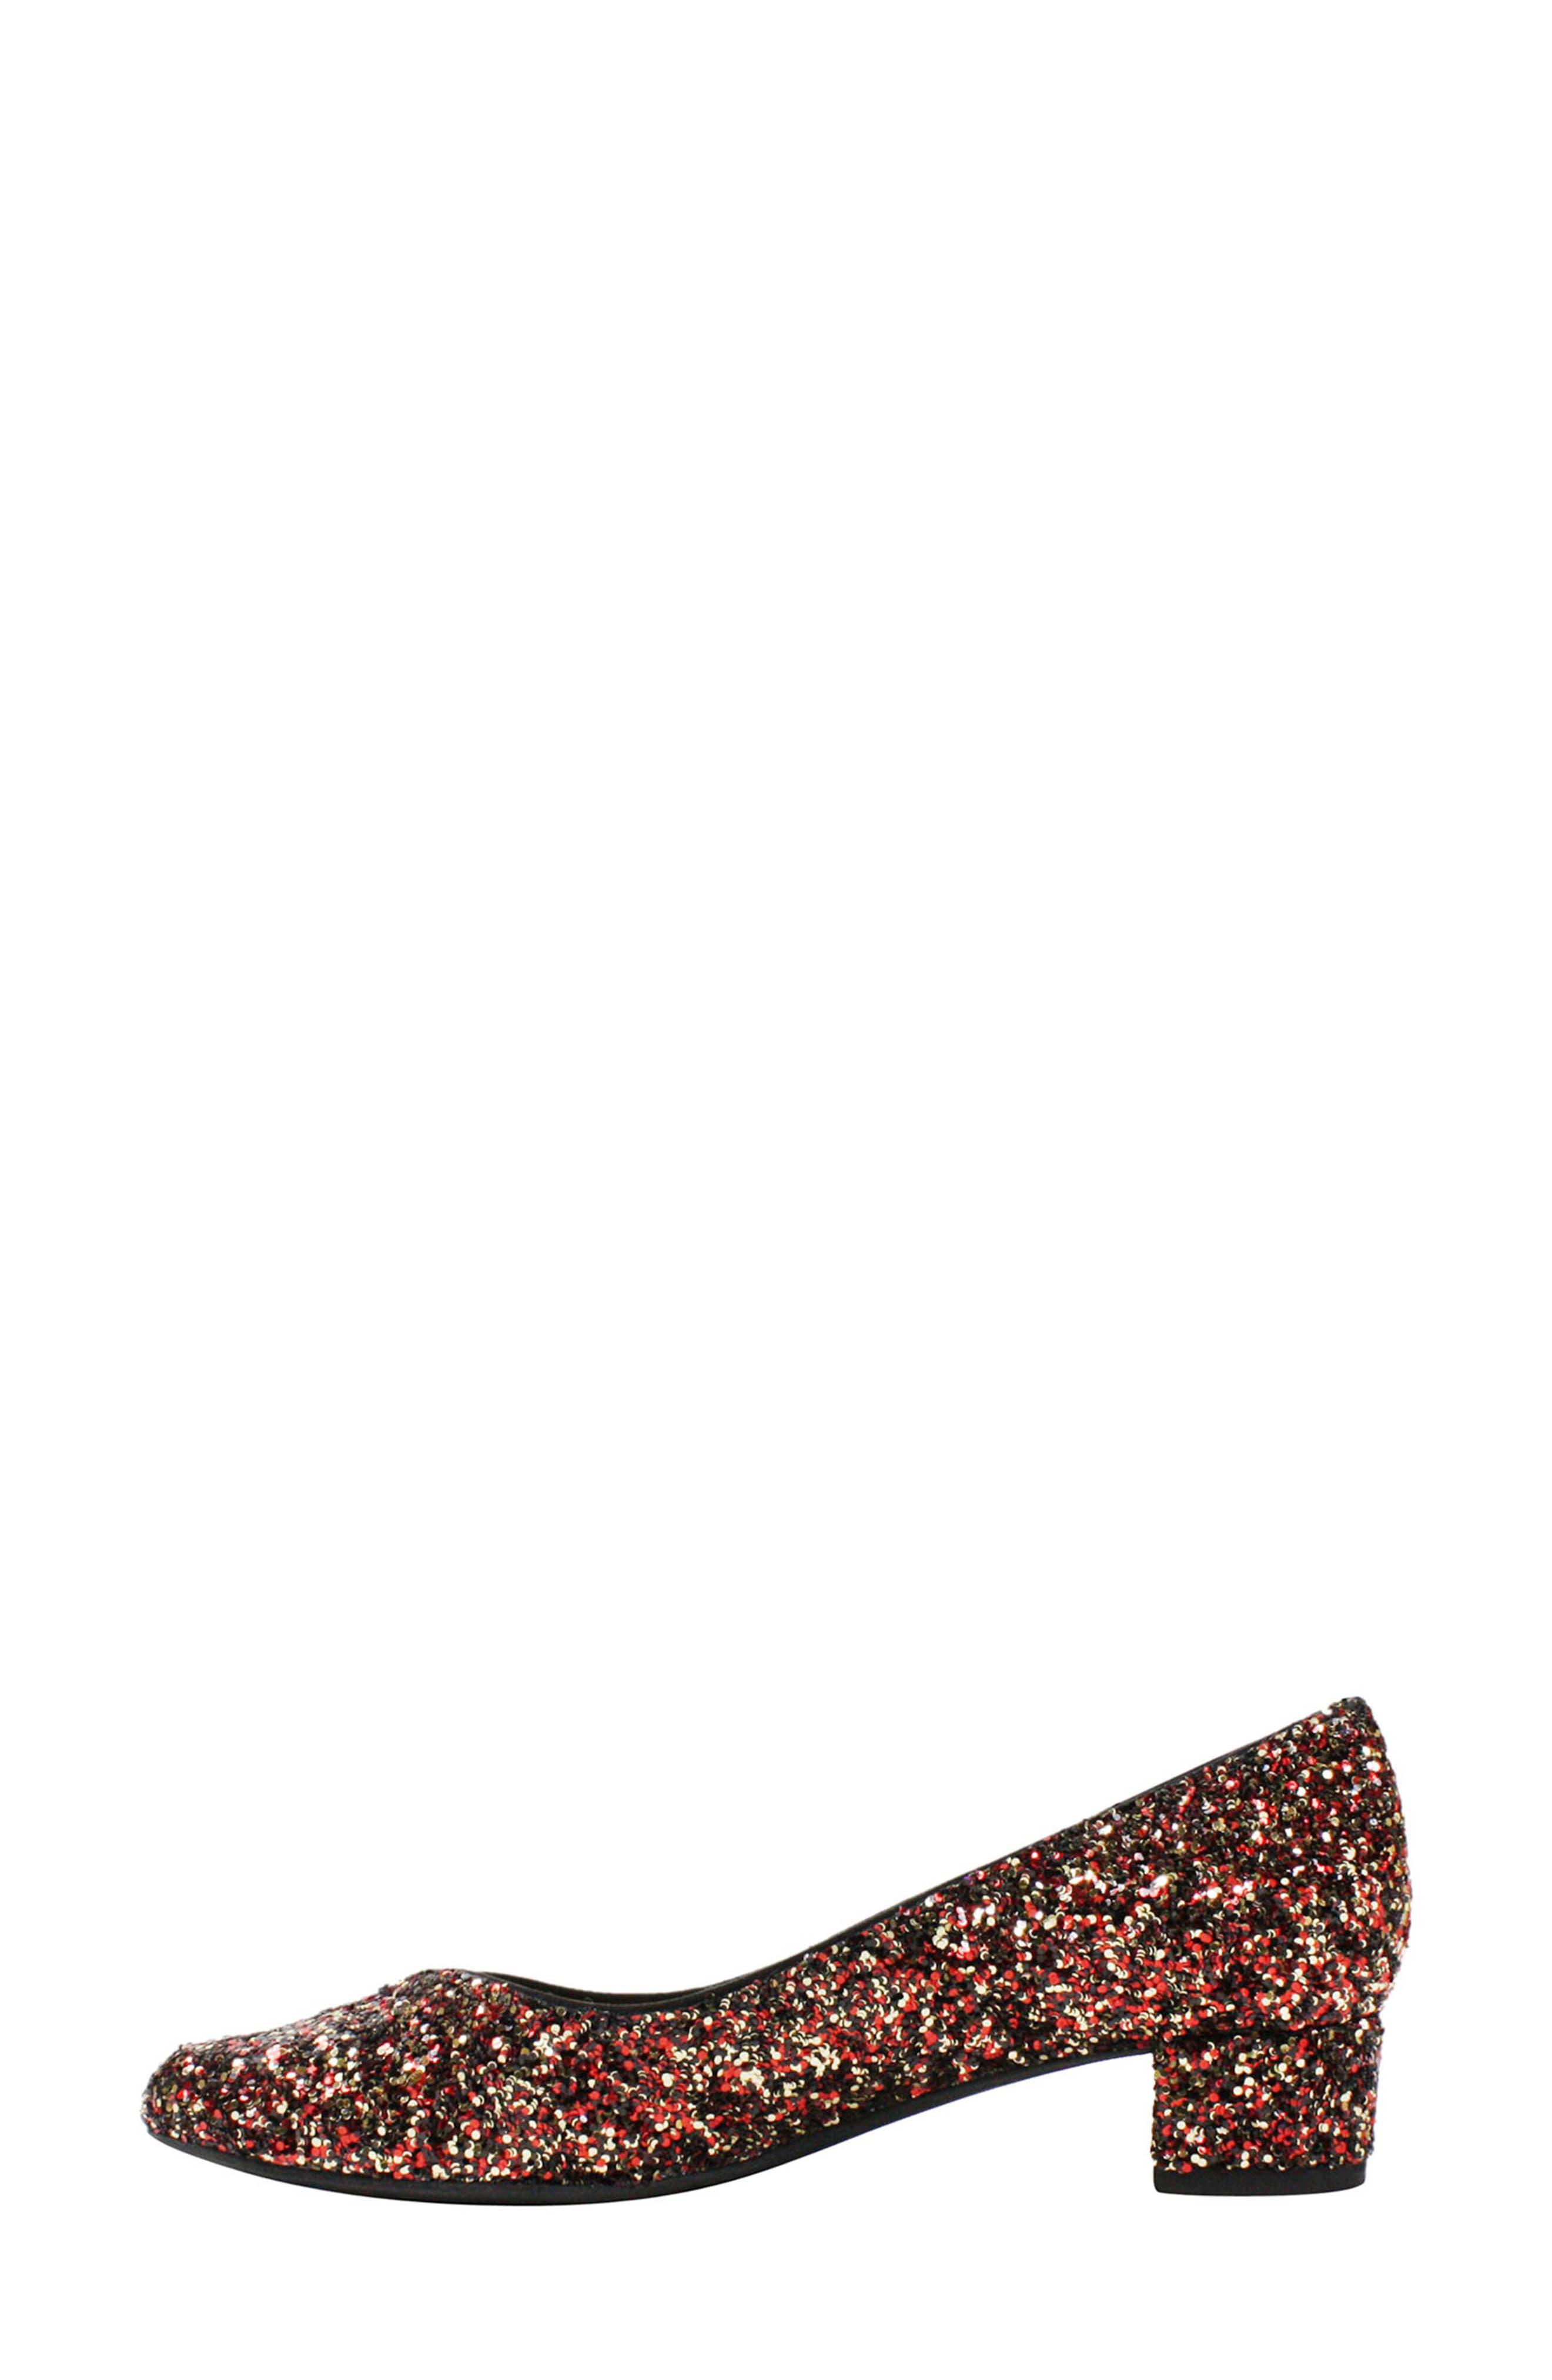 'Bambalina' Block Heel Glitter Pump,                             Alternate thumbnail 2, color,                             Burgundy Glitter Fabric